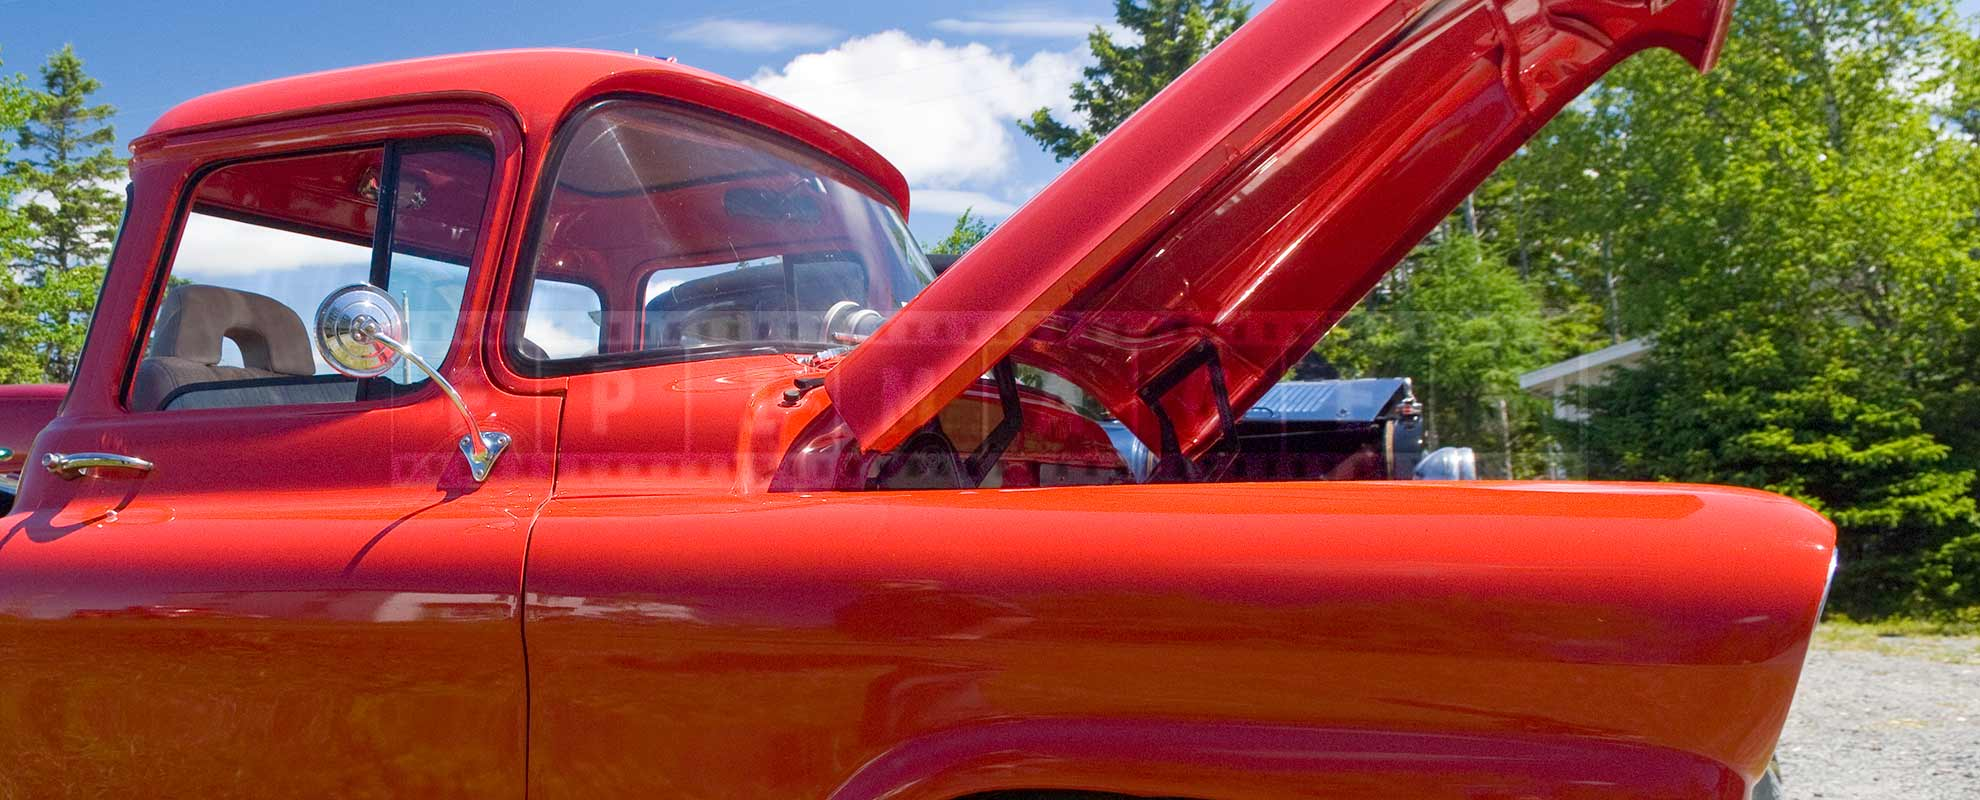 red half ton truck